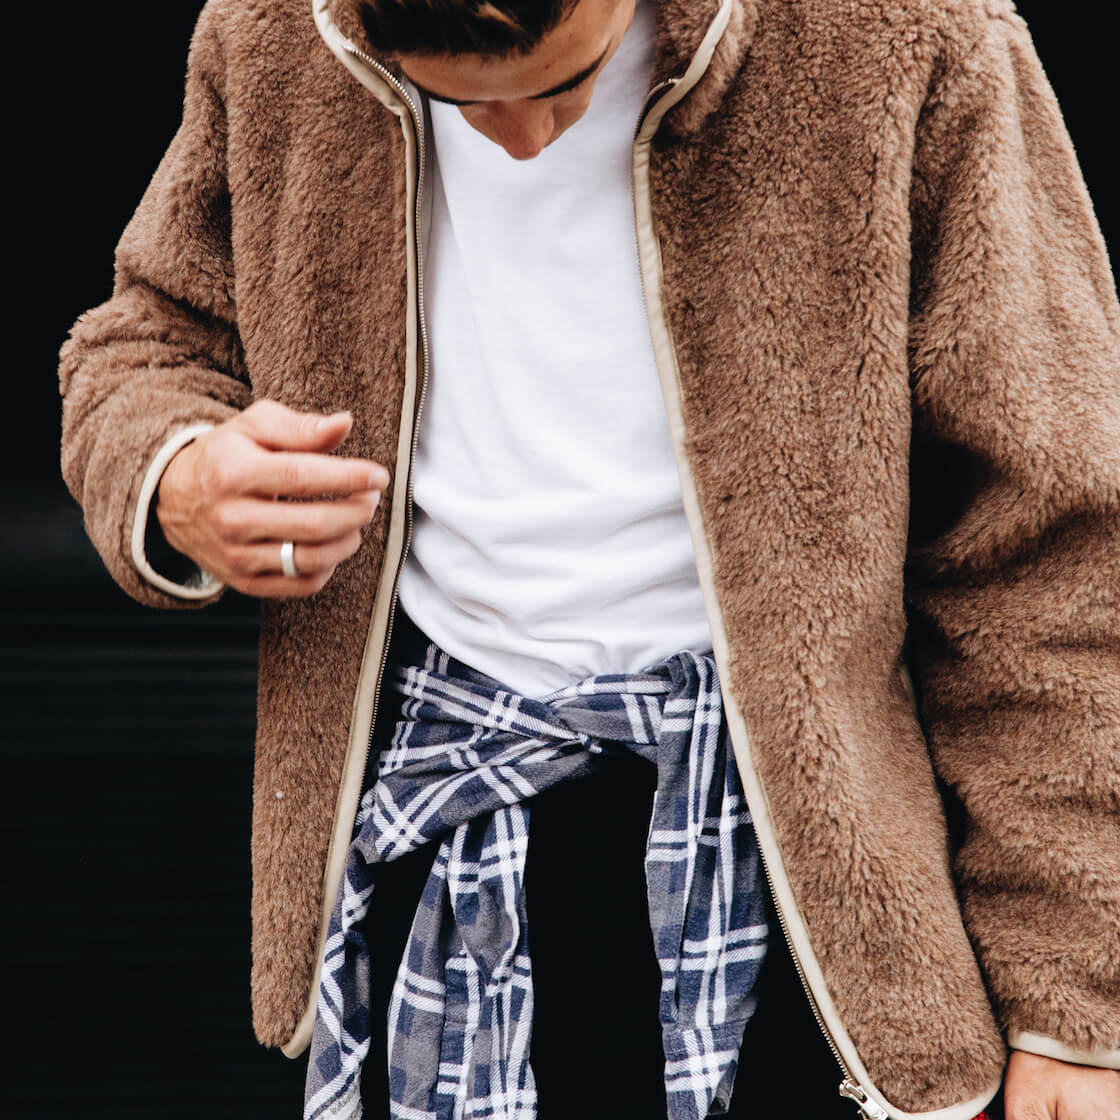 Needles clothing japan shaggy shearling jacket on body 2